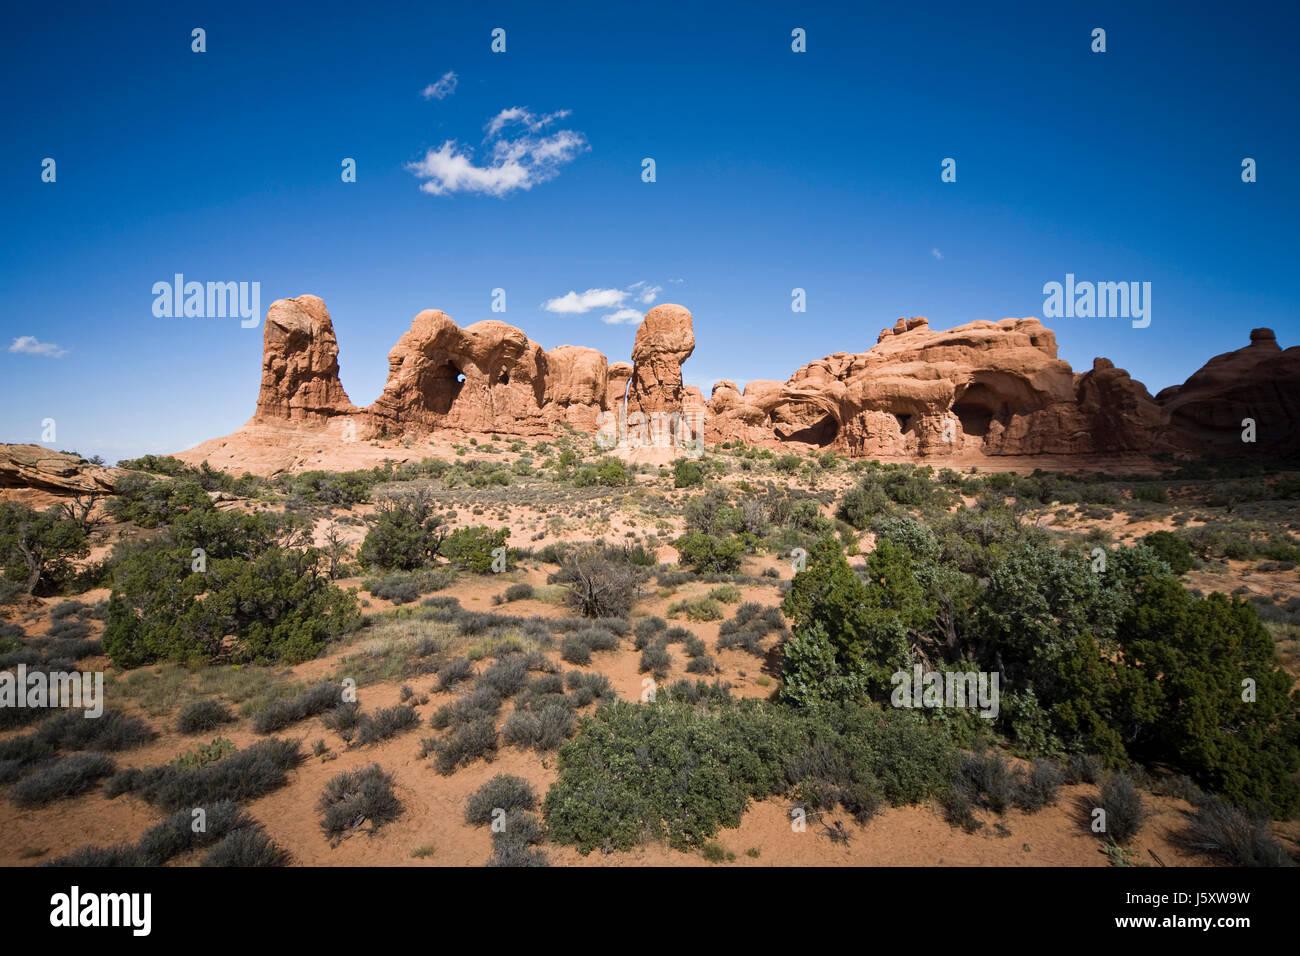 national park usa sandstone double look alike look-alike stone national park - Stock Image